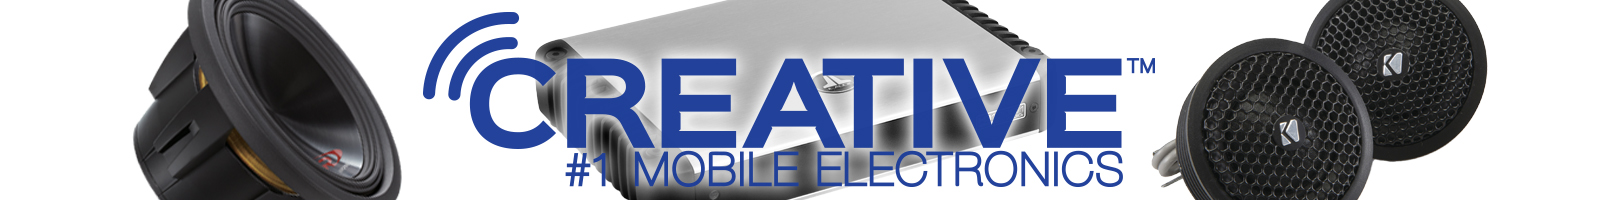 mobile-head5.jpg